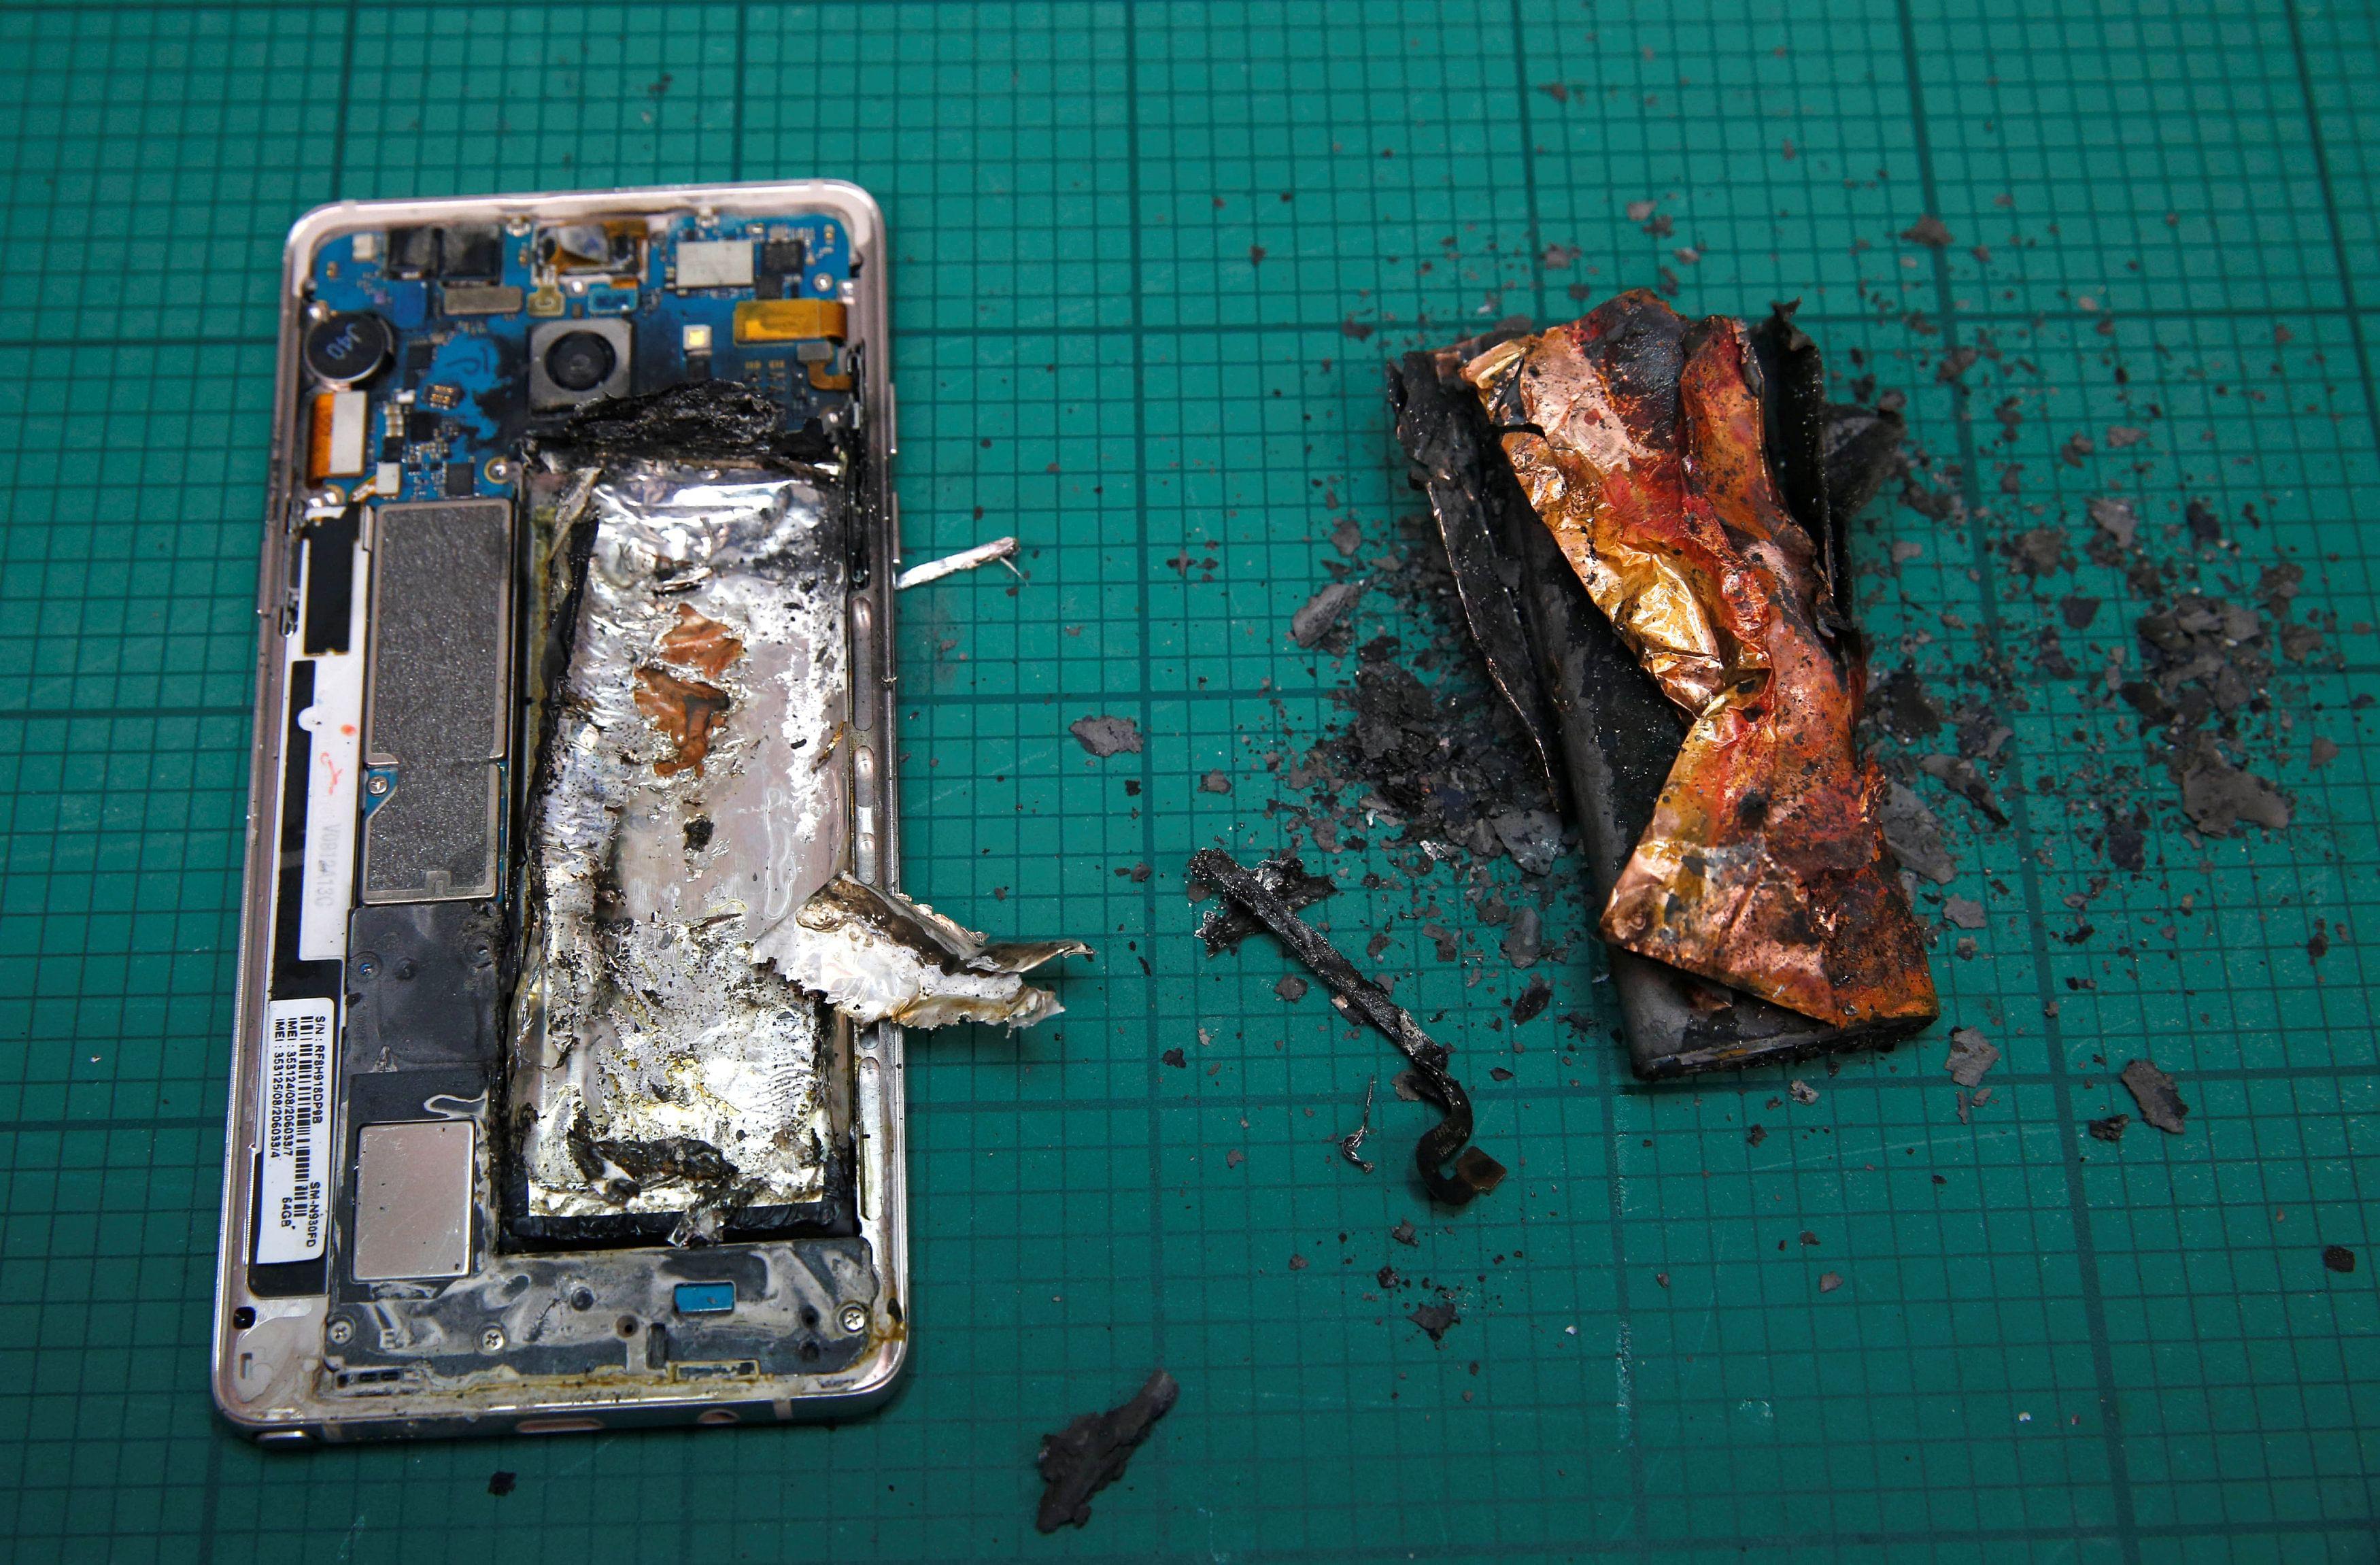 SIA, Jetstar, Qantas ban Galaxy Note 7 from flights